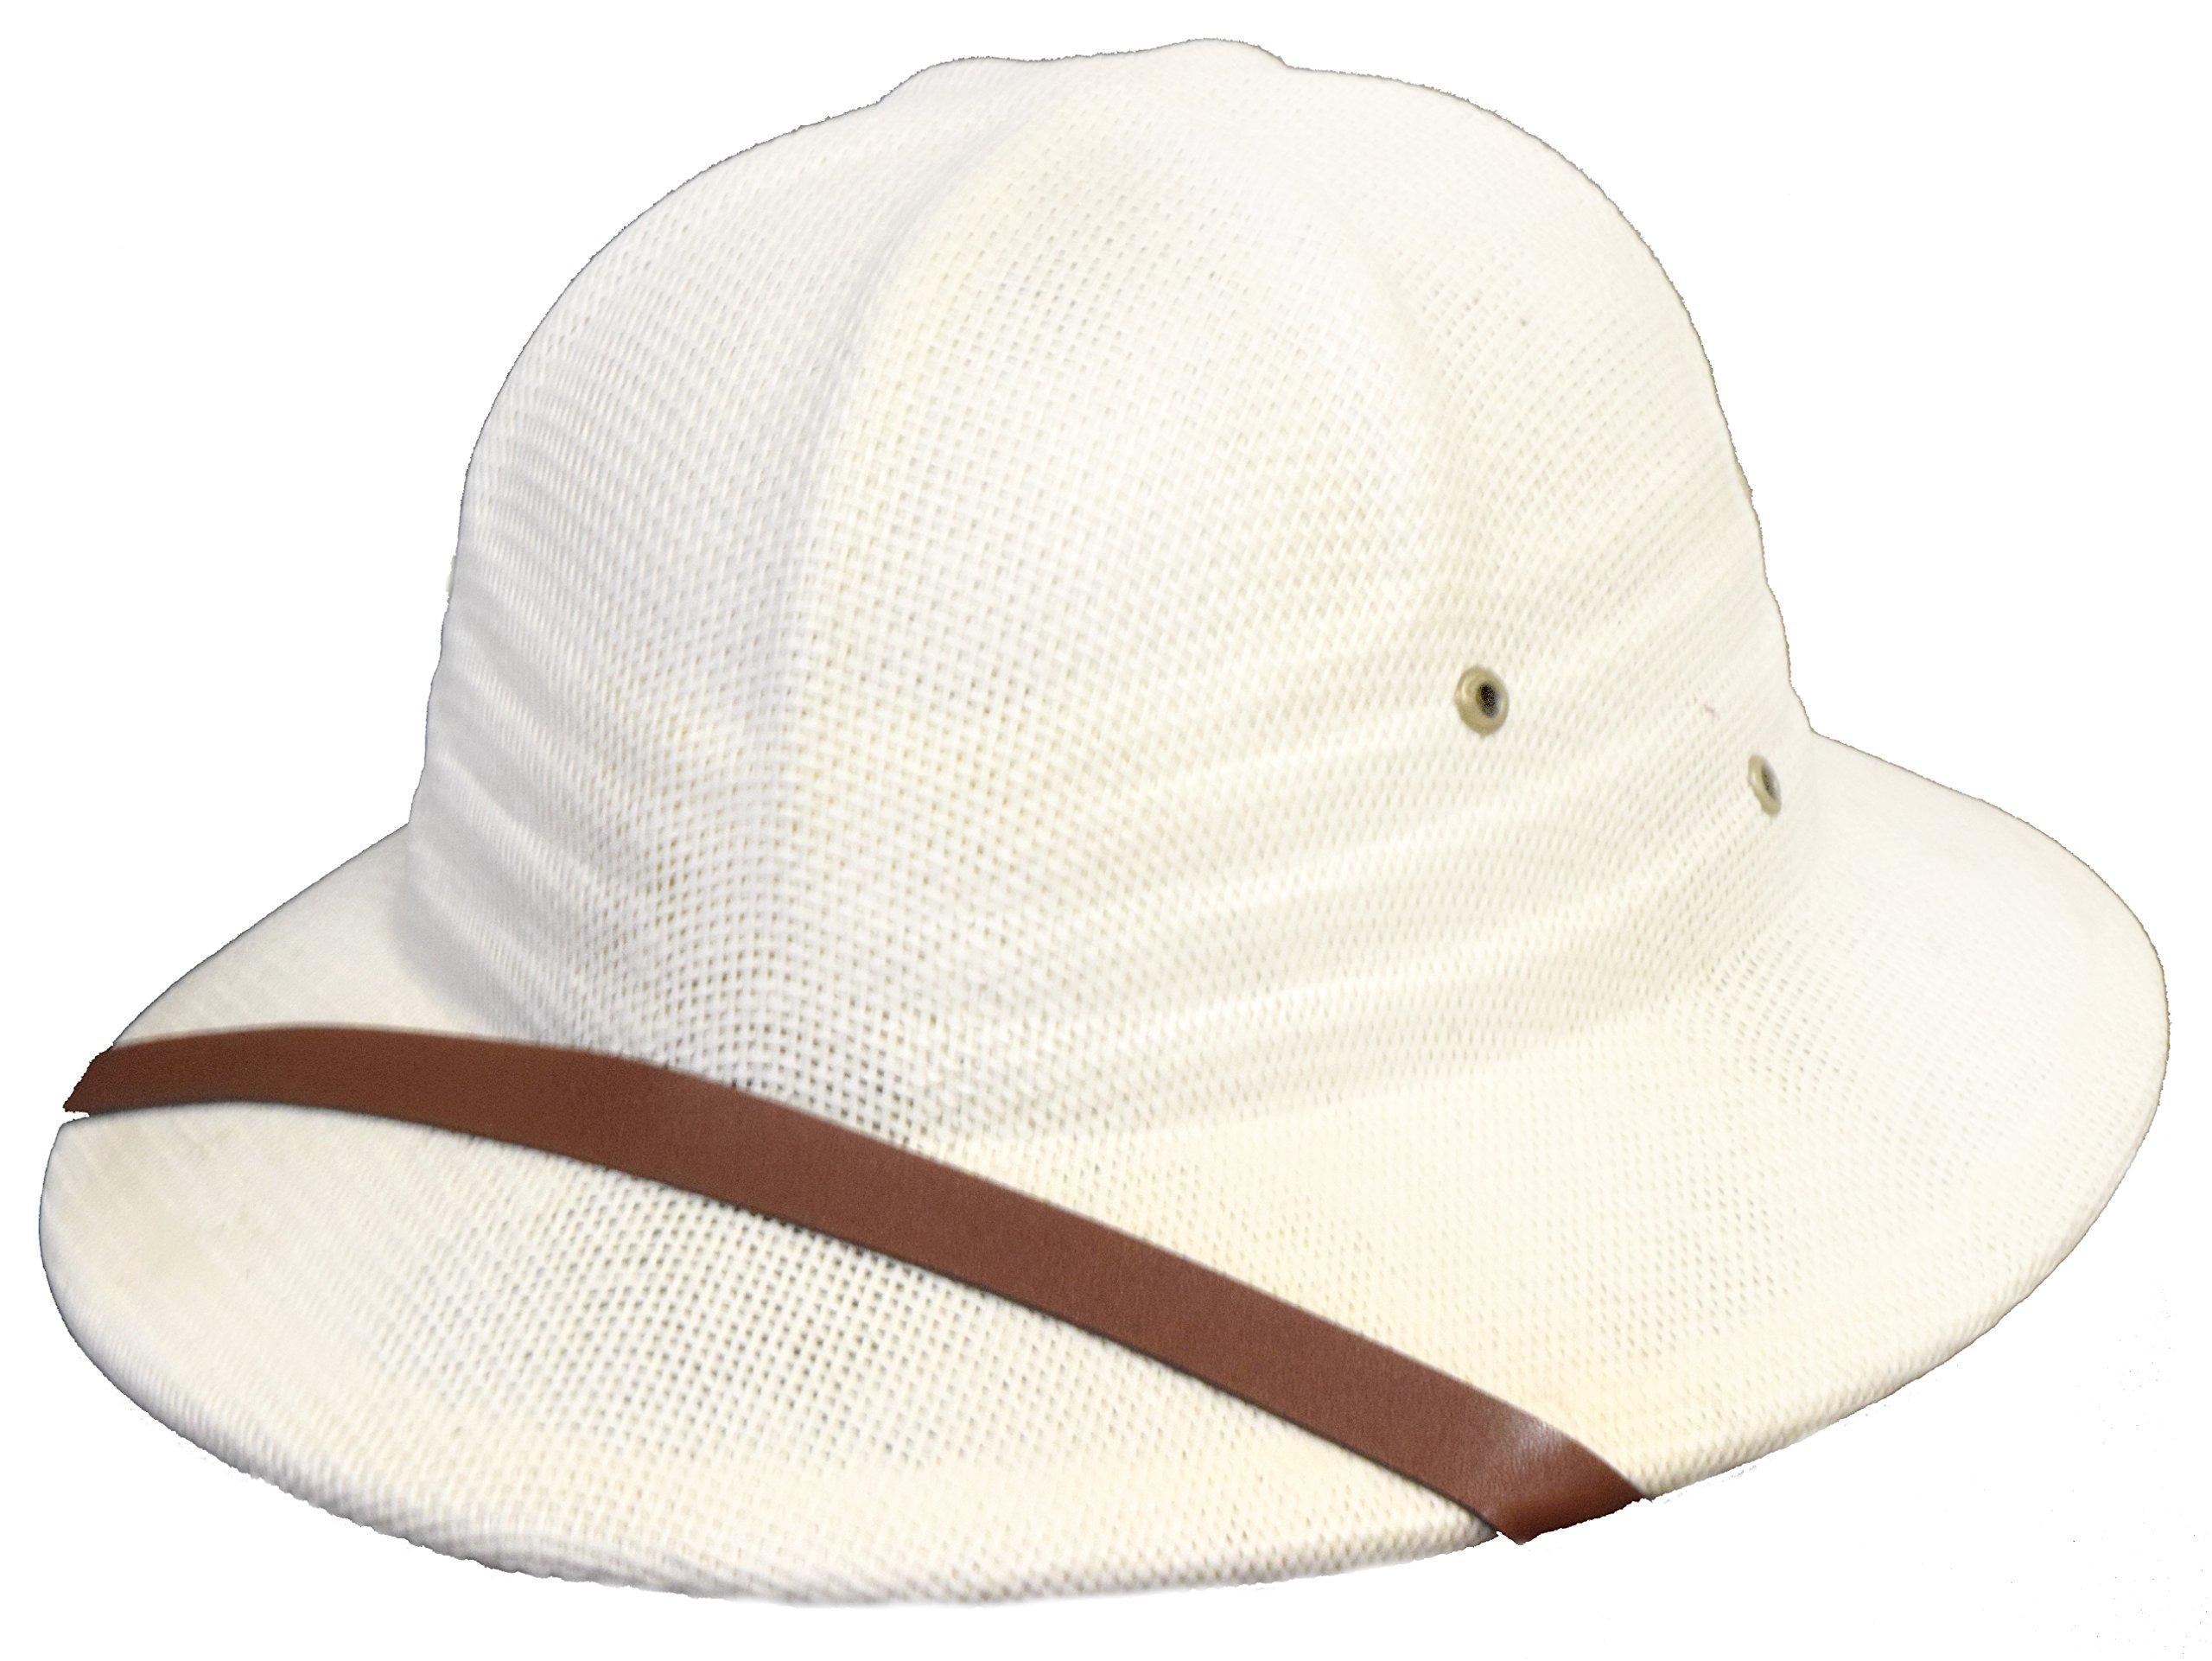 6e62808df58 Best Rated in Men s Sun Hats   Helpful Customer Reviews - Amazon.com